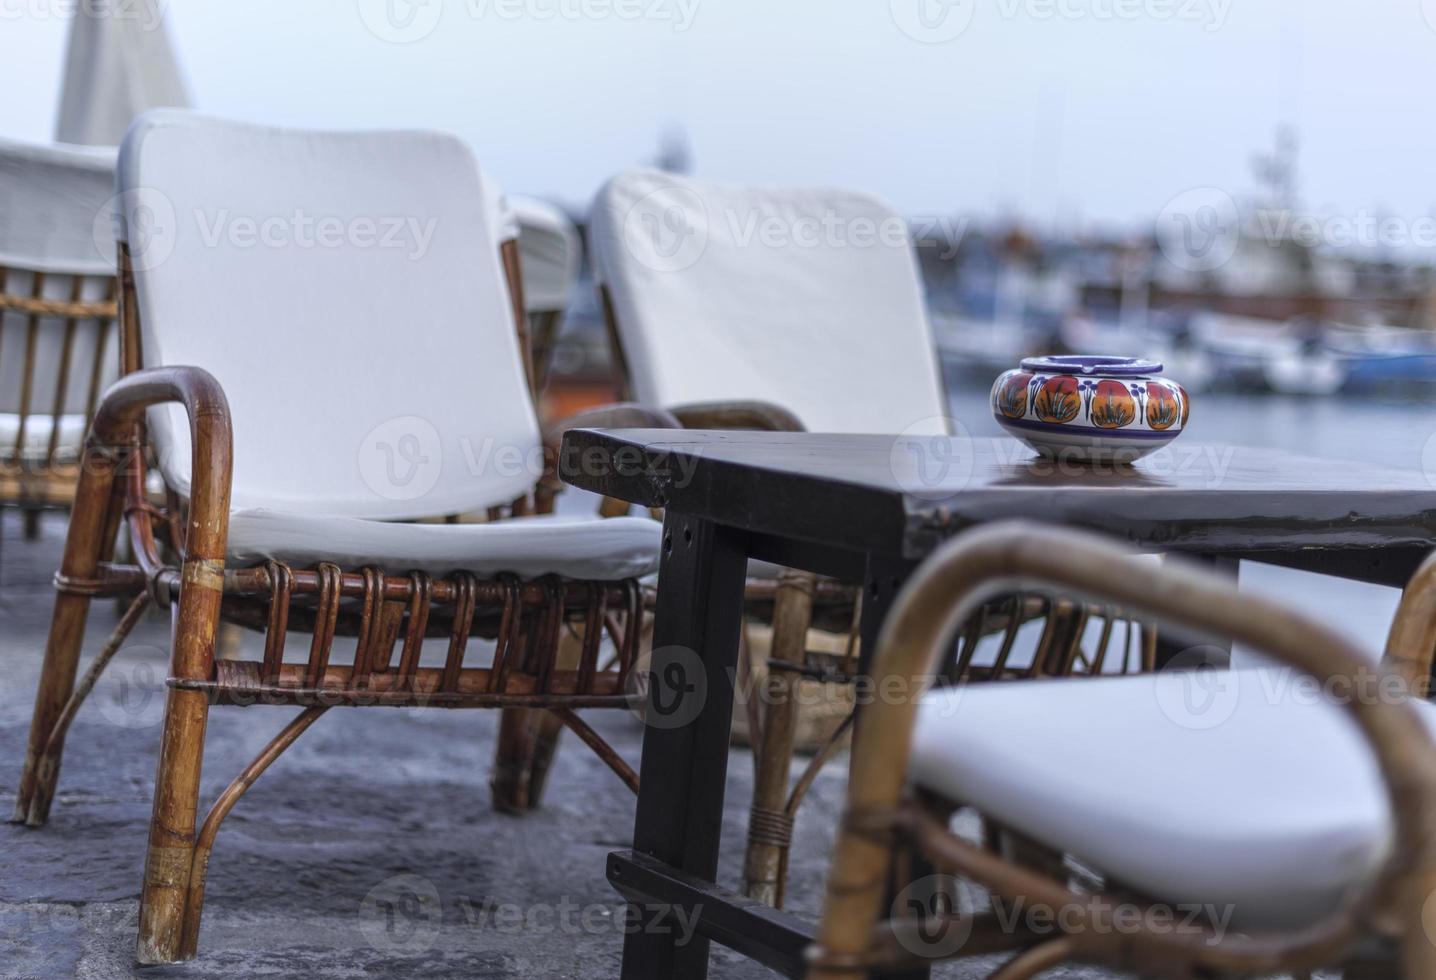 sant'angelo d'ischia, bar porto. italo relax. moda foto